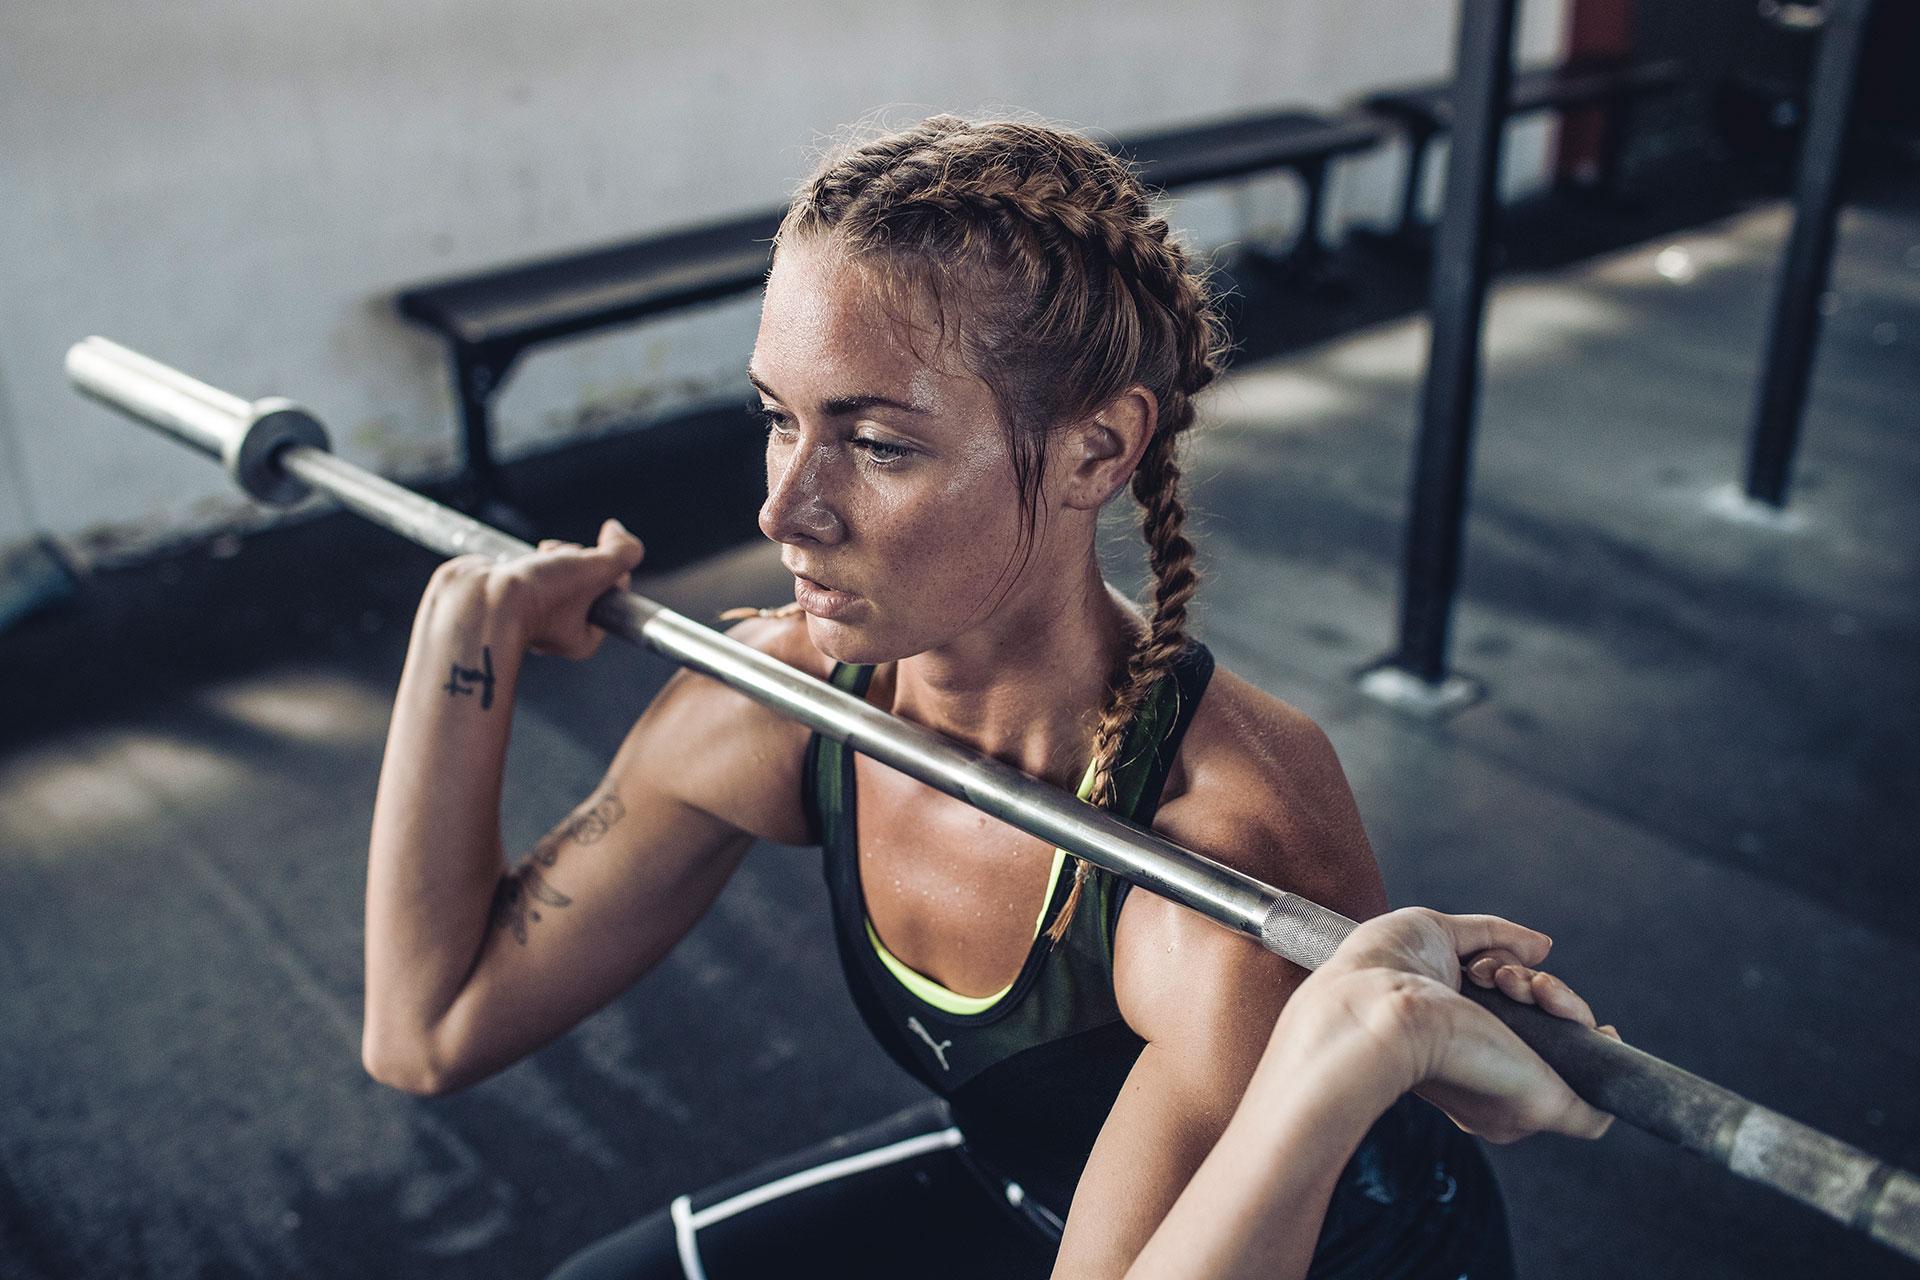 training sport fotograf fitness crossfit sport zuerich schweiz hantel